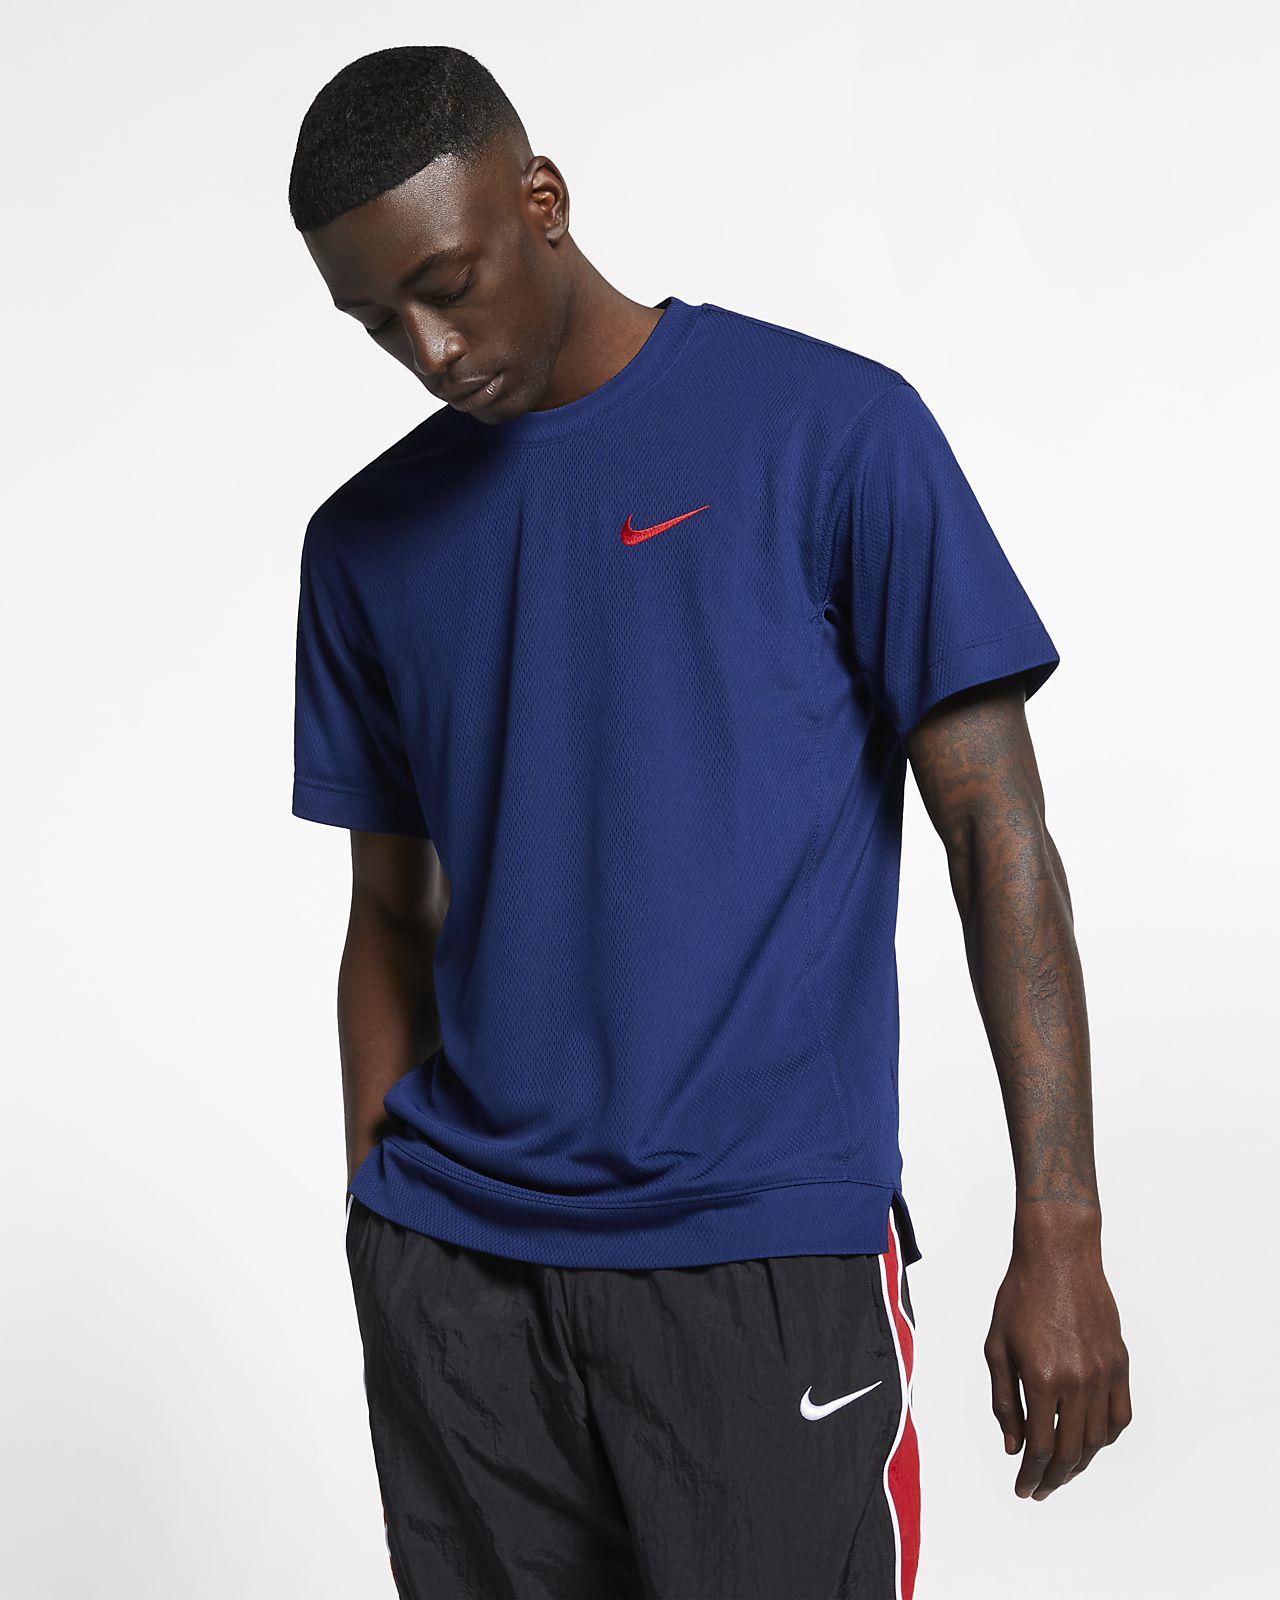 Nike Dri-FIT Classic Men's Short-Sleeve Basketball Top